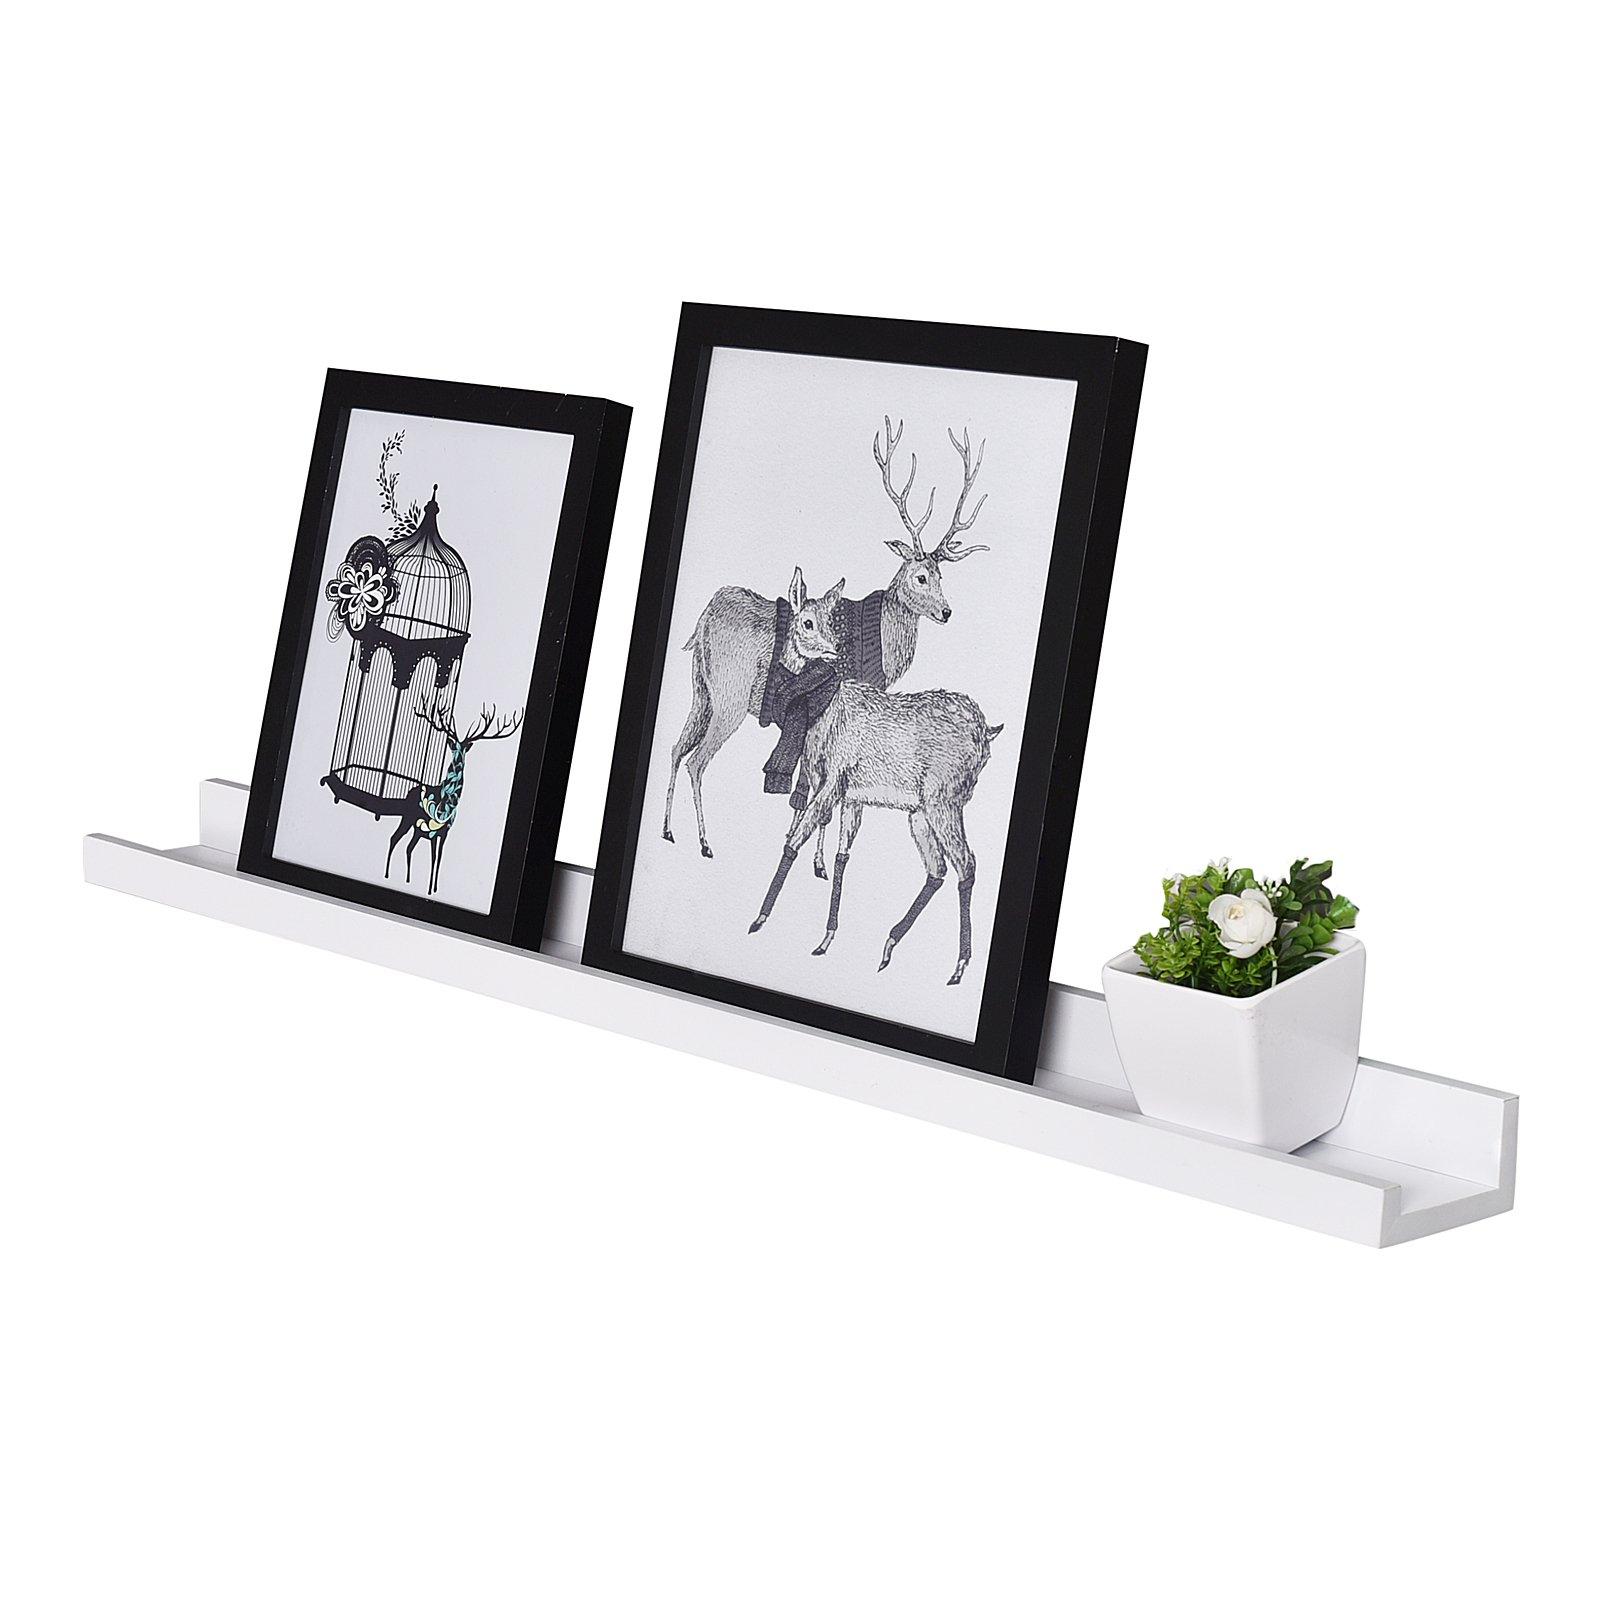 WELLAND Vista Floating Picture Ledge Display Wall Shelf, 48-inch, White